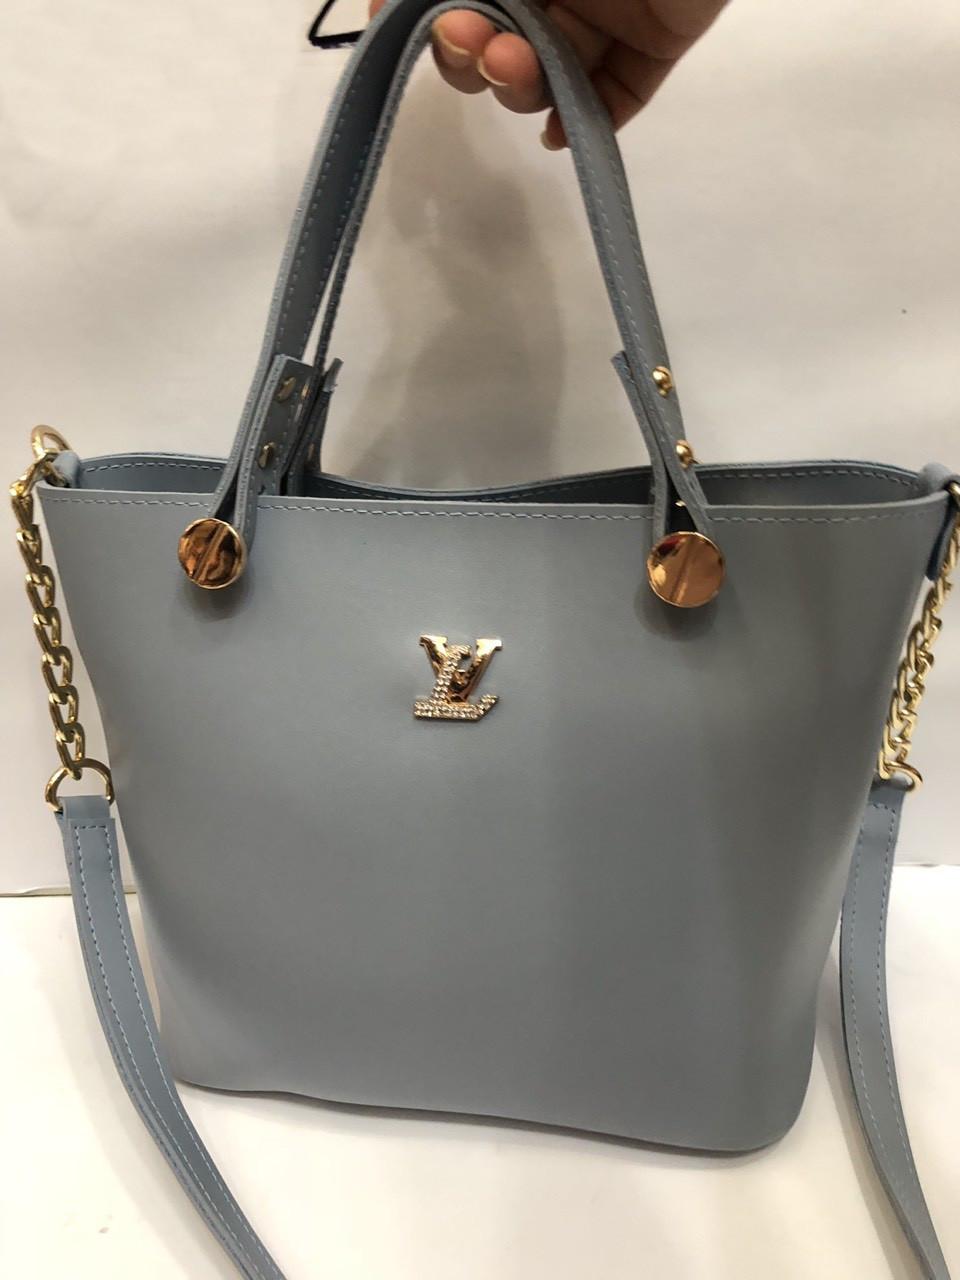 26bb8bf17754 Женская Сумка Louis Vuitton (Луи Виттон), Голубая — в Категории ...